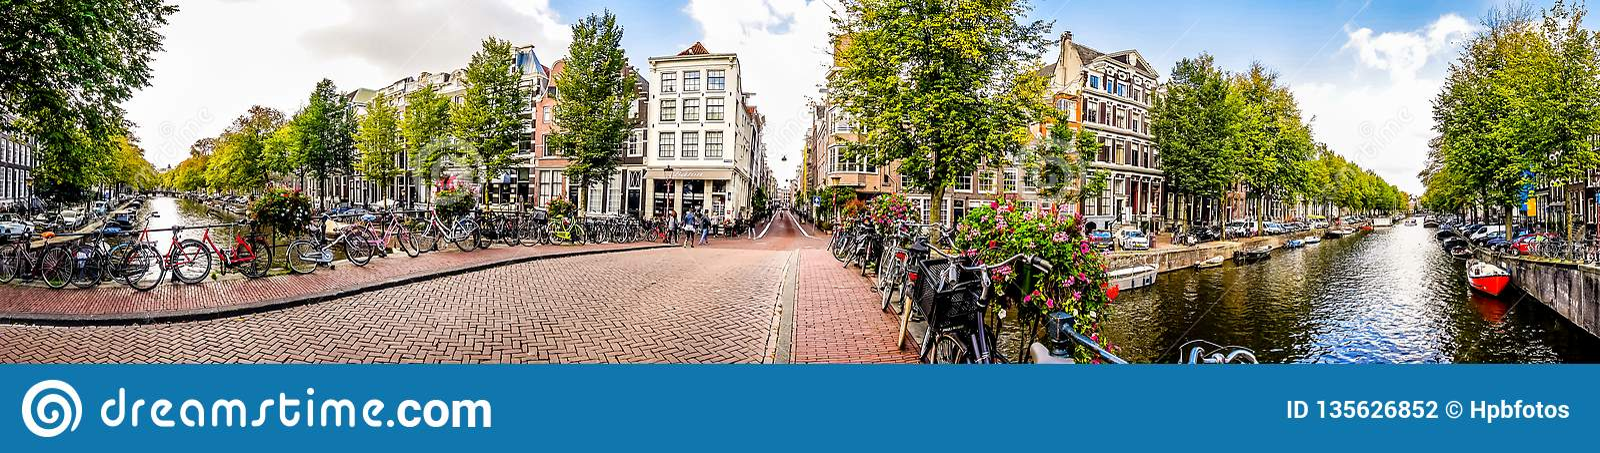 Взгляд панорамы канала Herengracht в Амстердаме в Голландии